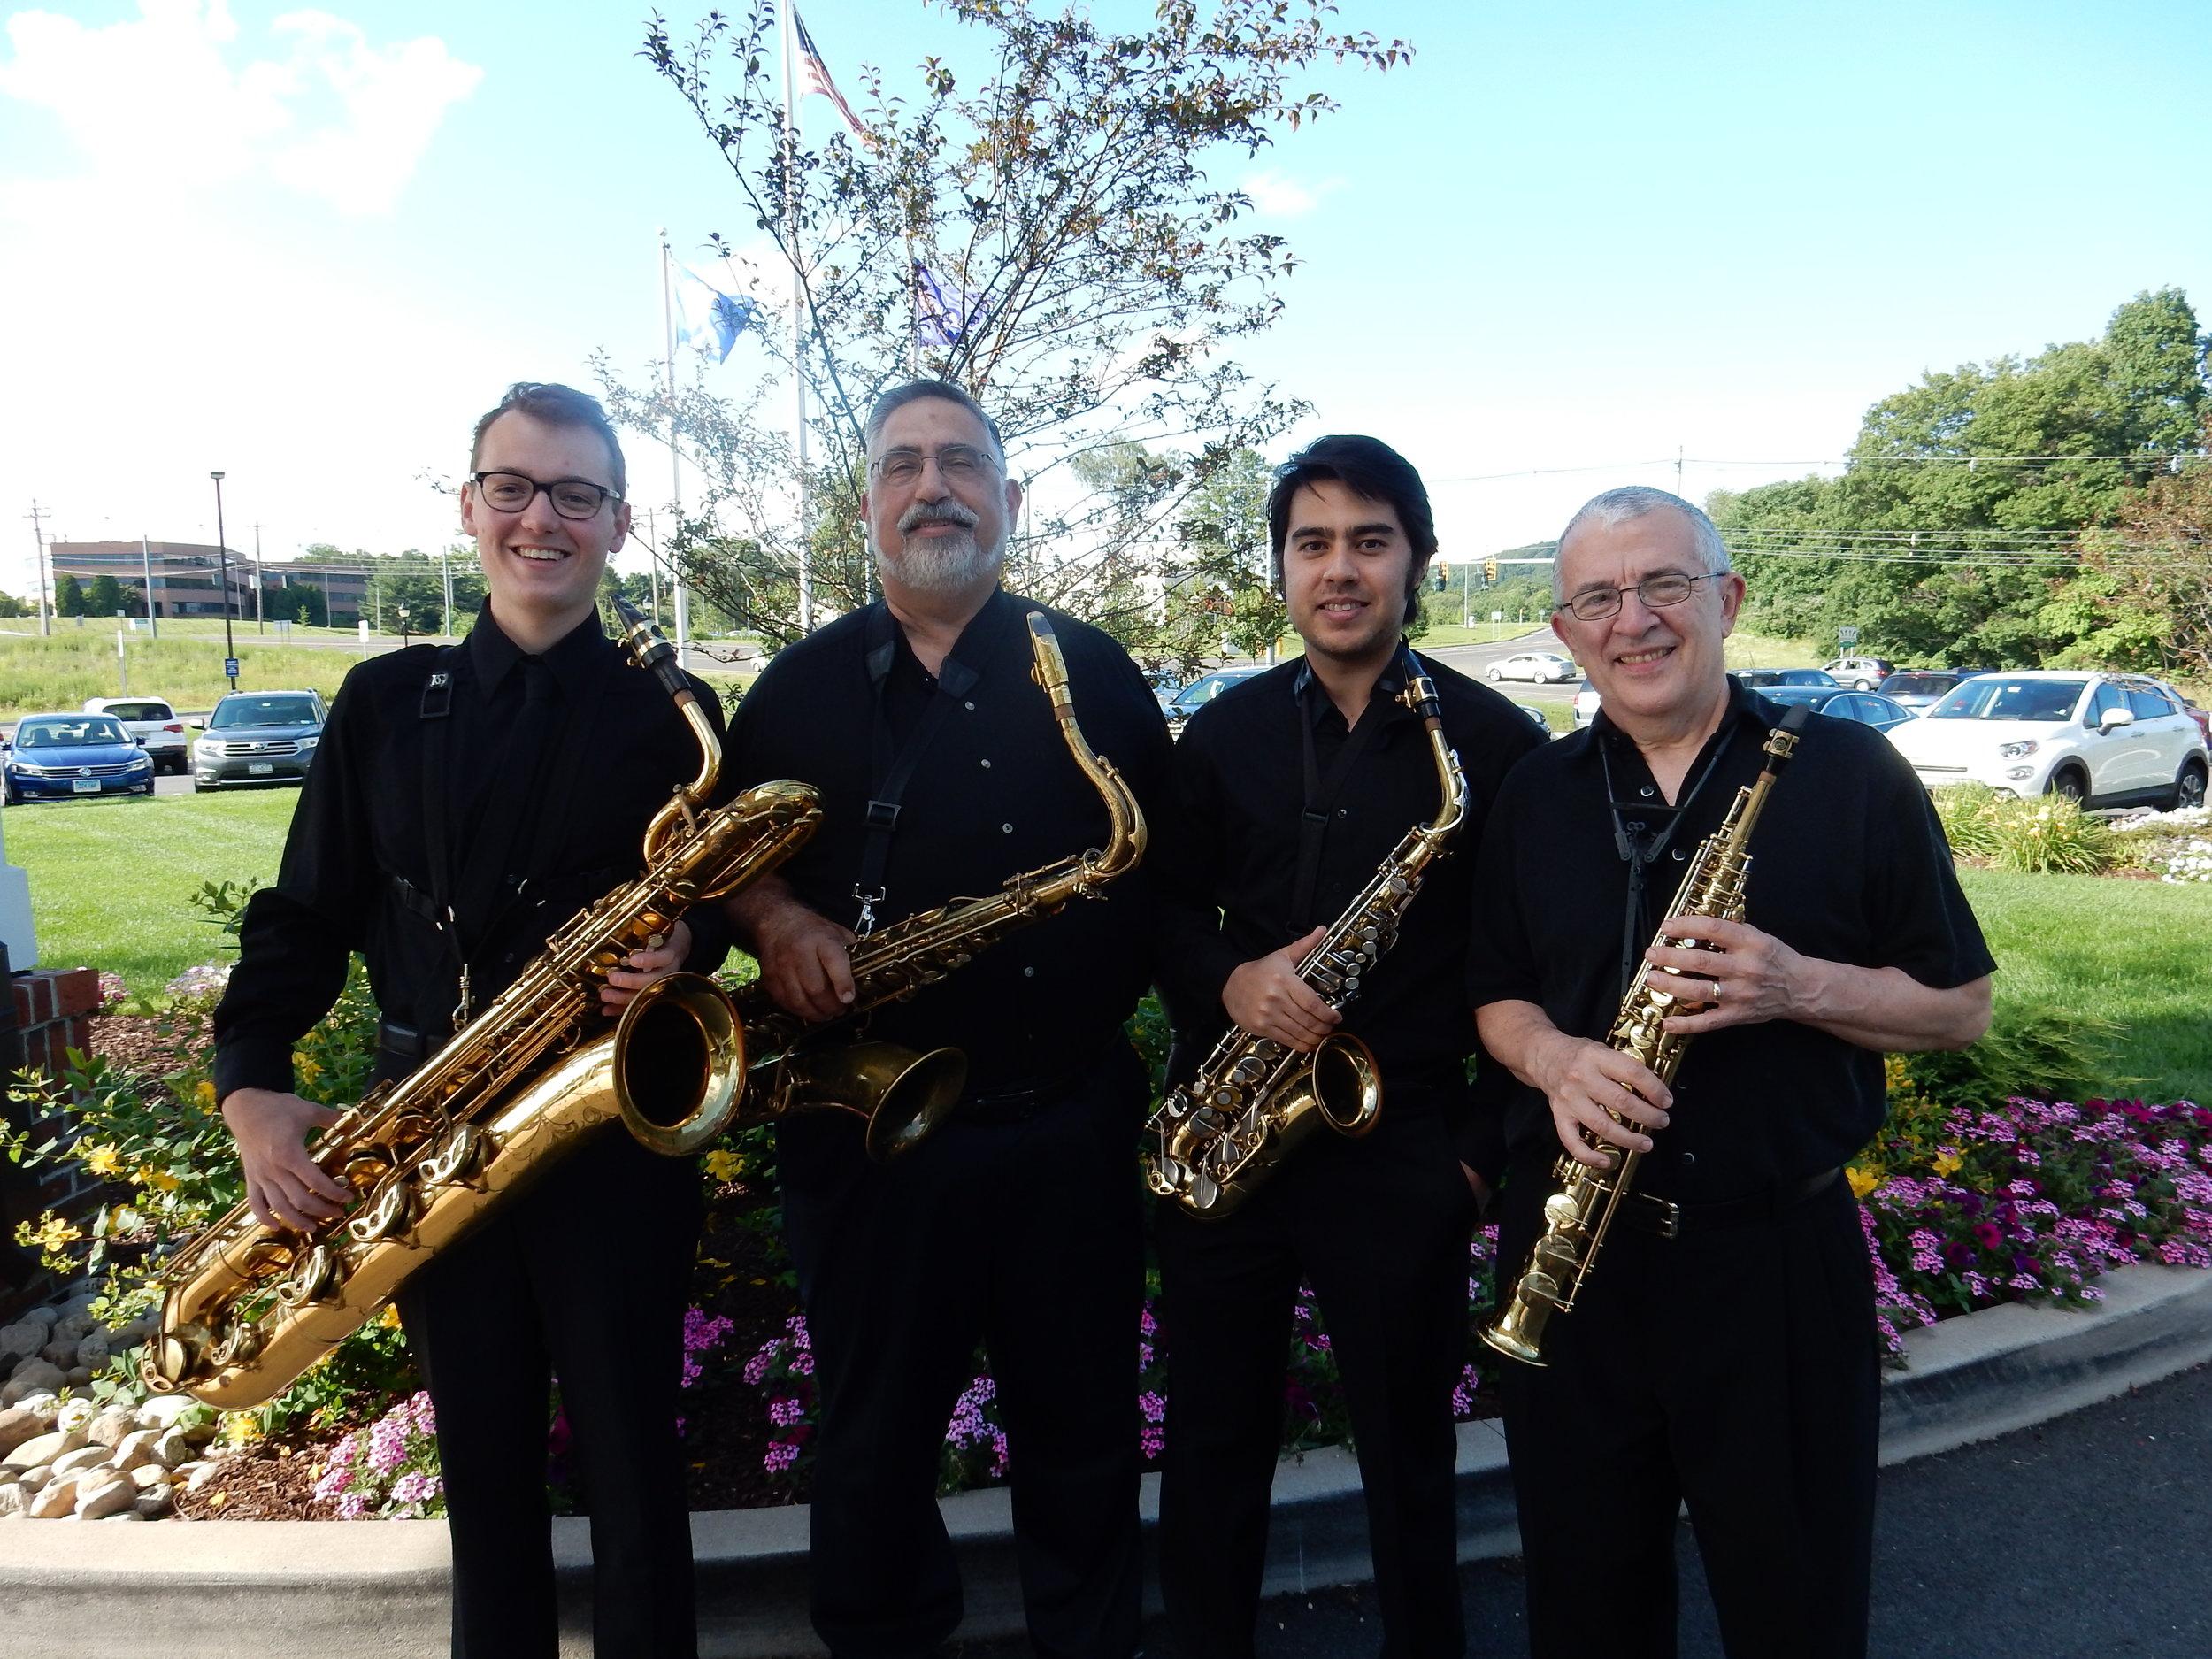 Frank Vasi - Thimble Island Saxophone Quartet